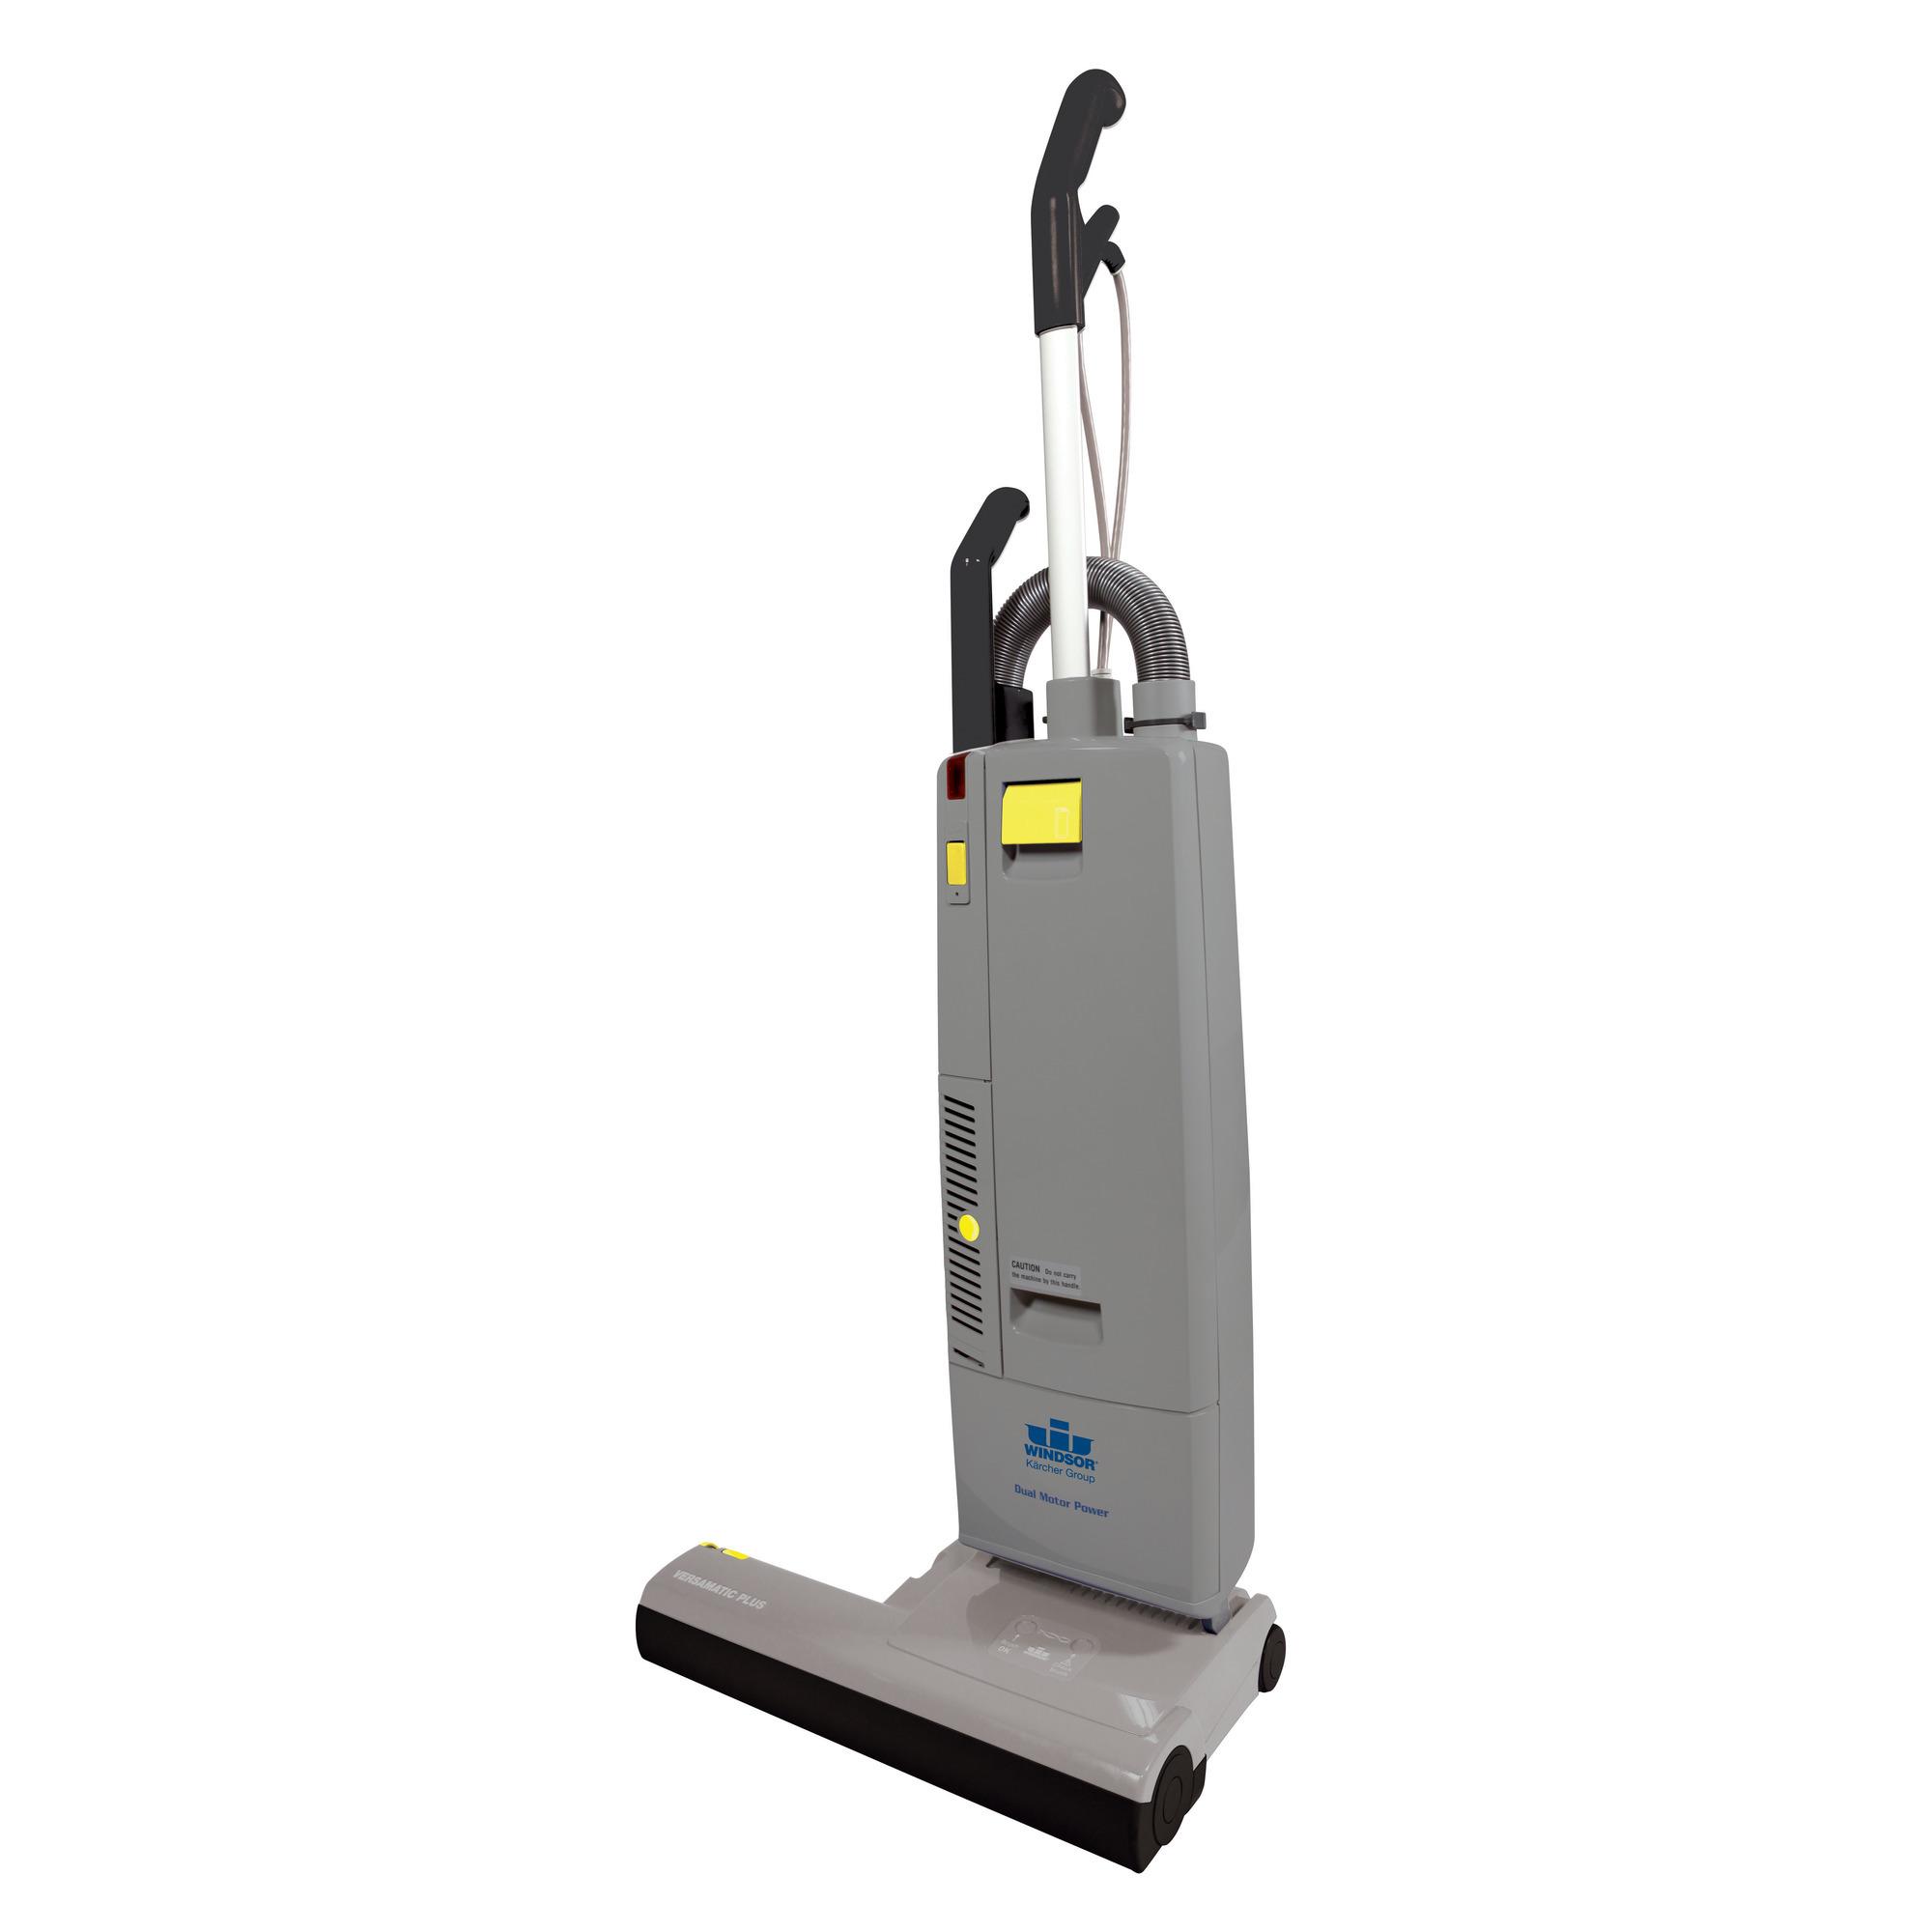 edge tc imagehandler four tomcat drive im carbon floors packaging ashx scrubber u traction quot floor